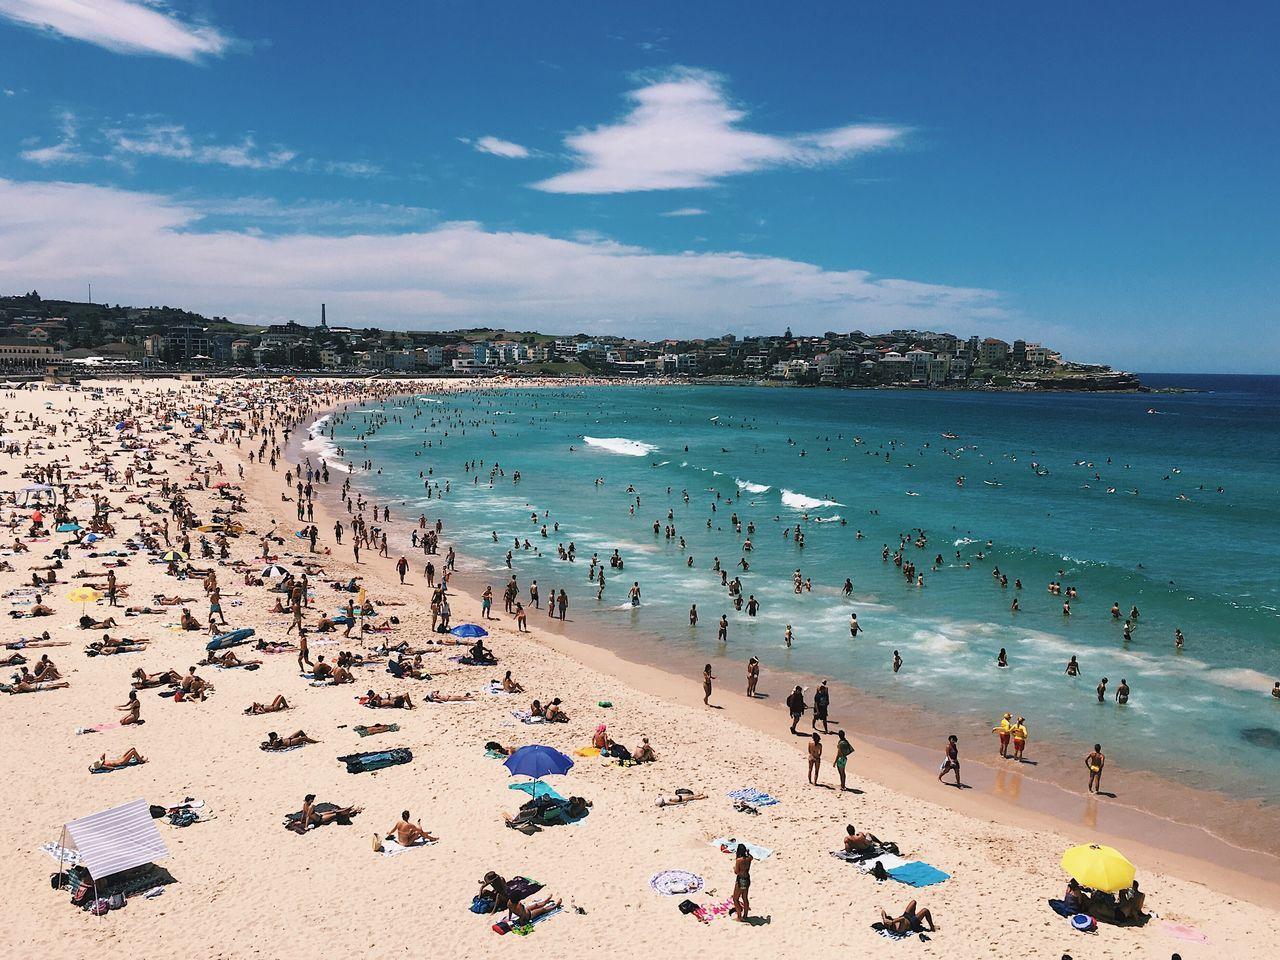 Sea Beach Water Sky Sand Outdoors Scenics Shore High Angle View Coastline Travel Destinations Vacations Day Bondi Beach Sydney Australia